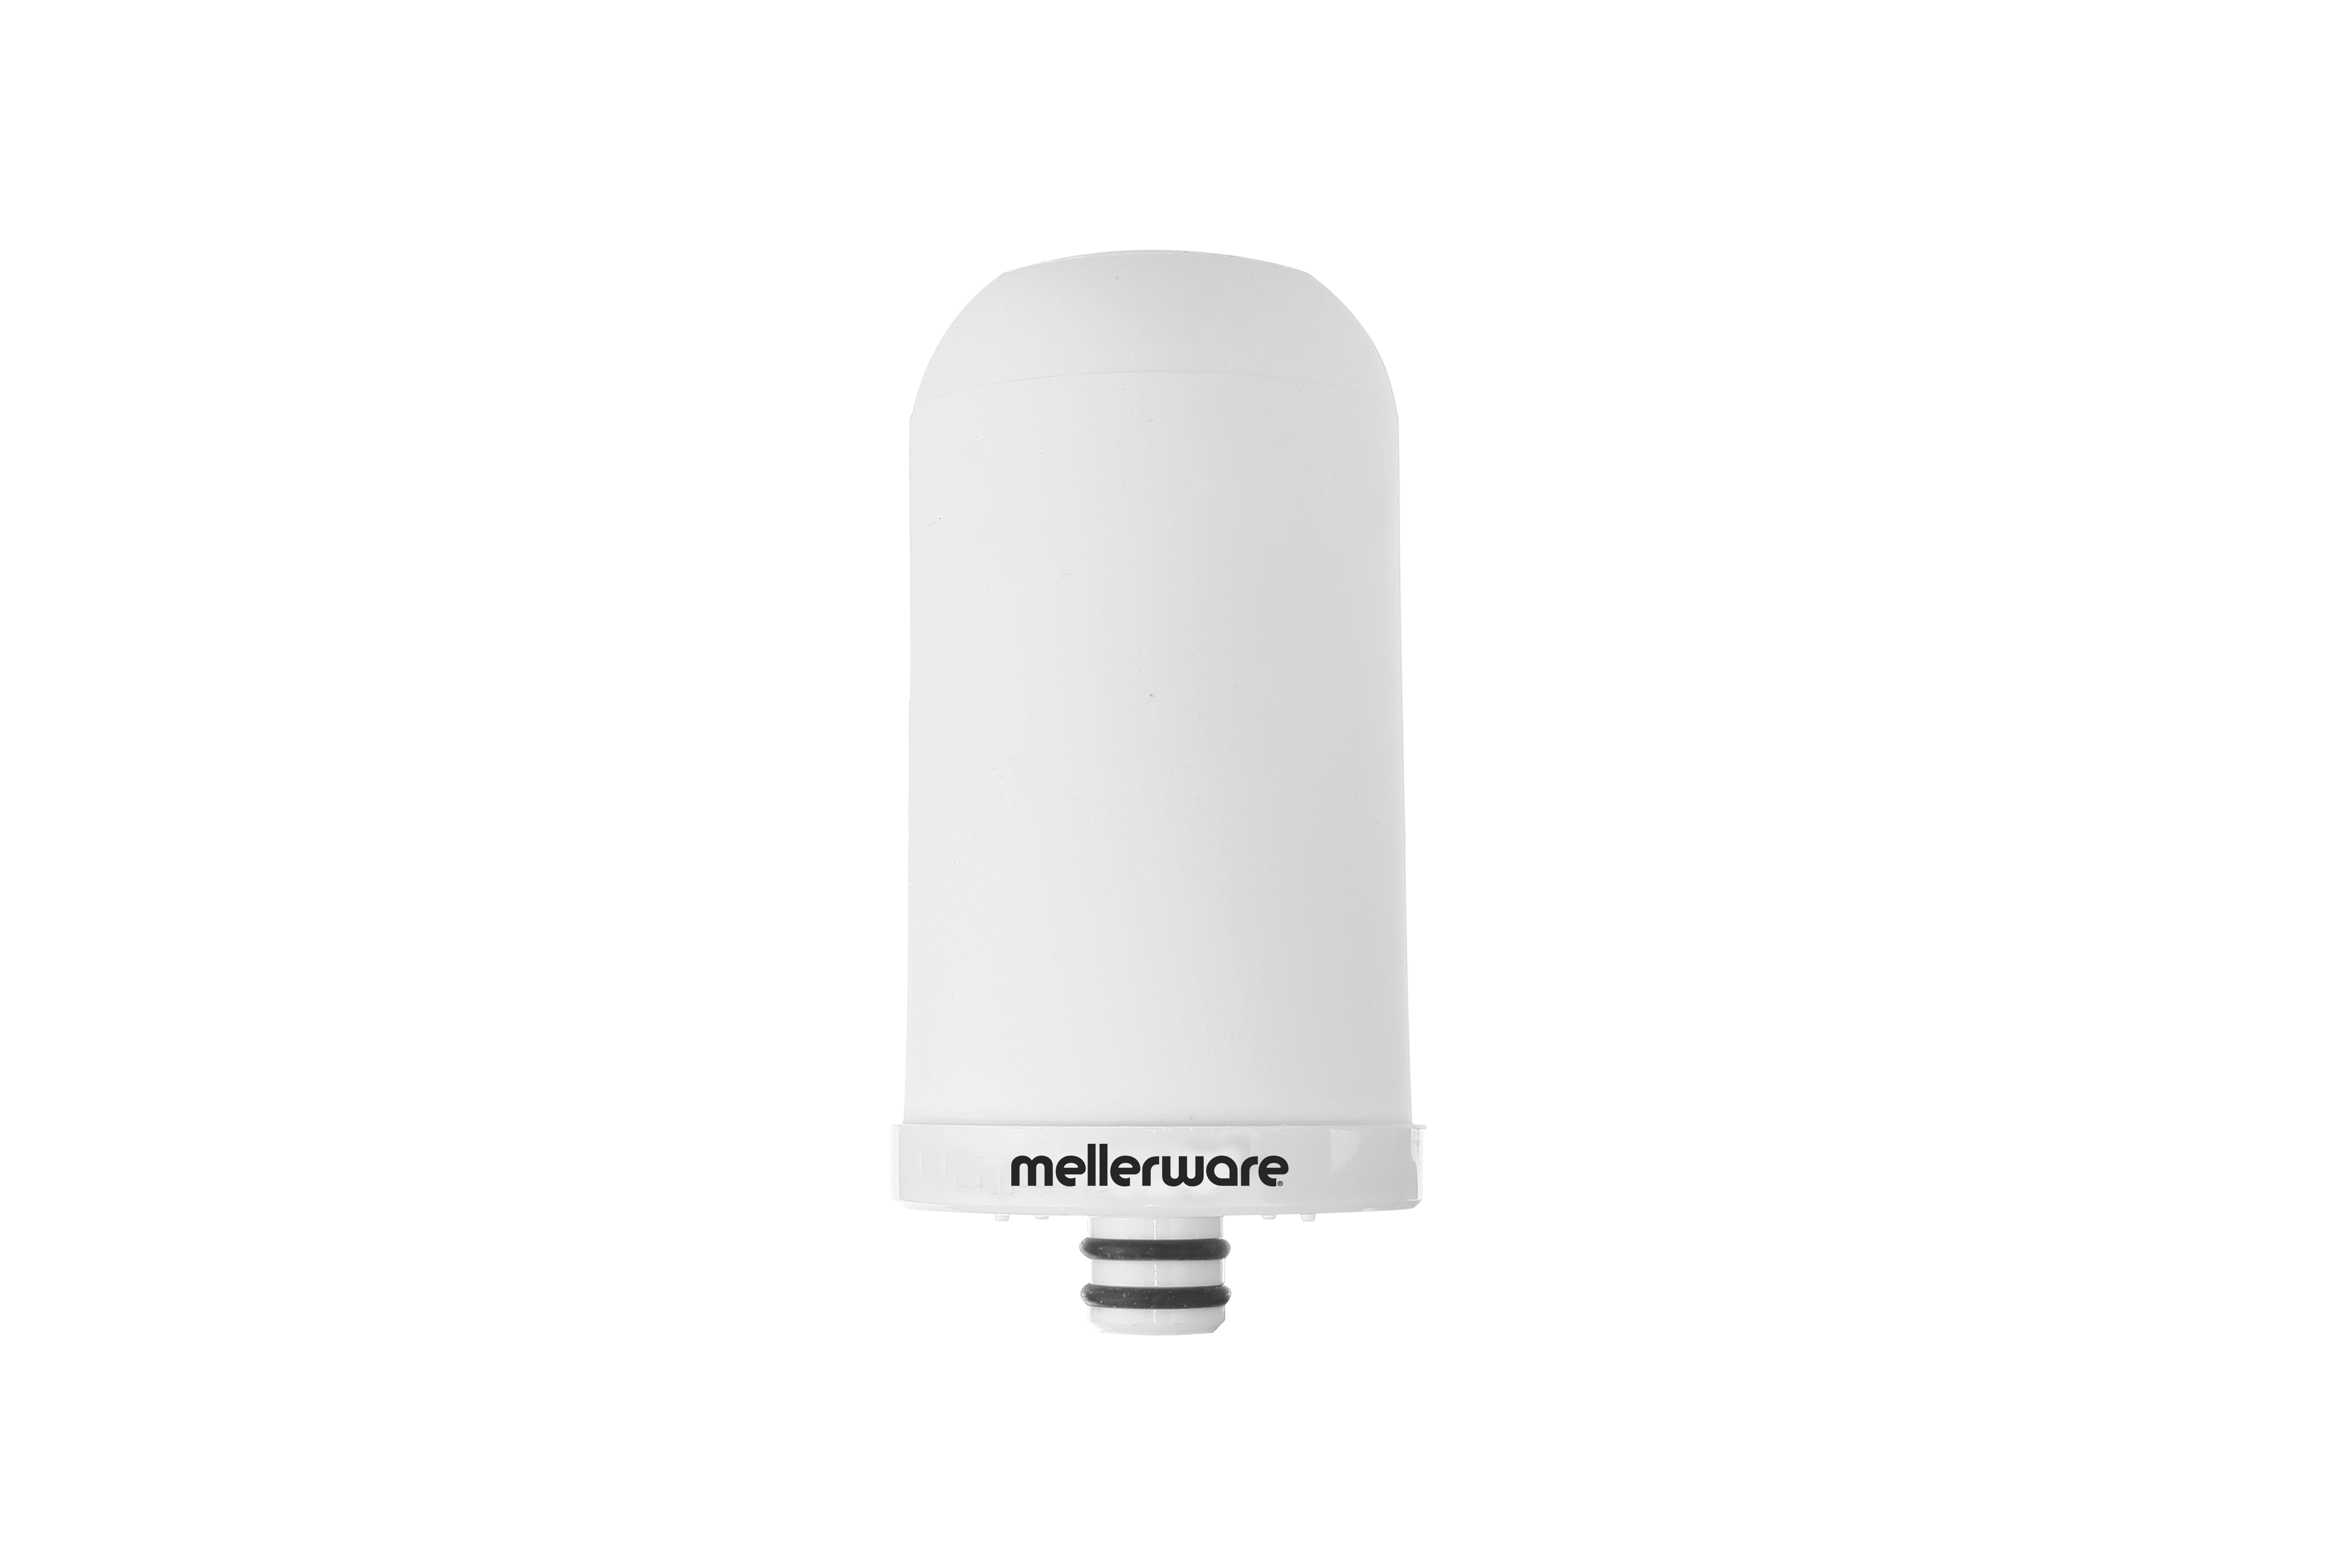 Mellerware Filter Ceramic White 2000L Per Filter